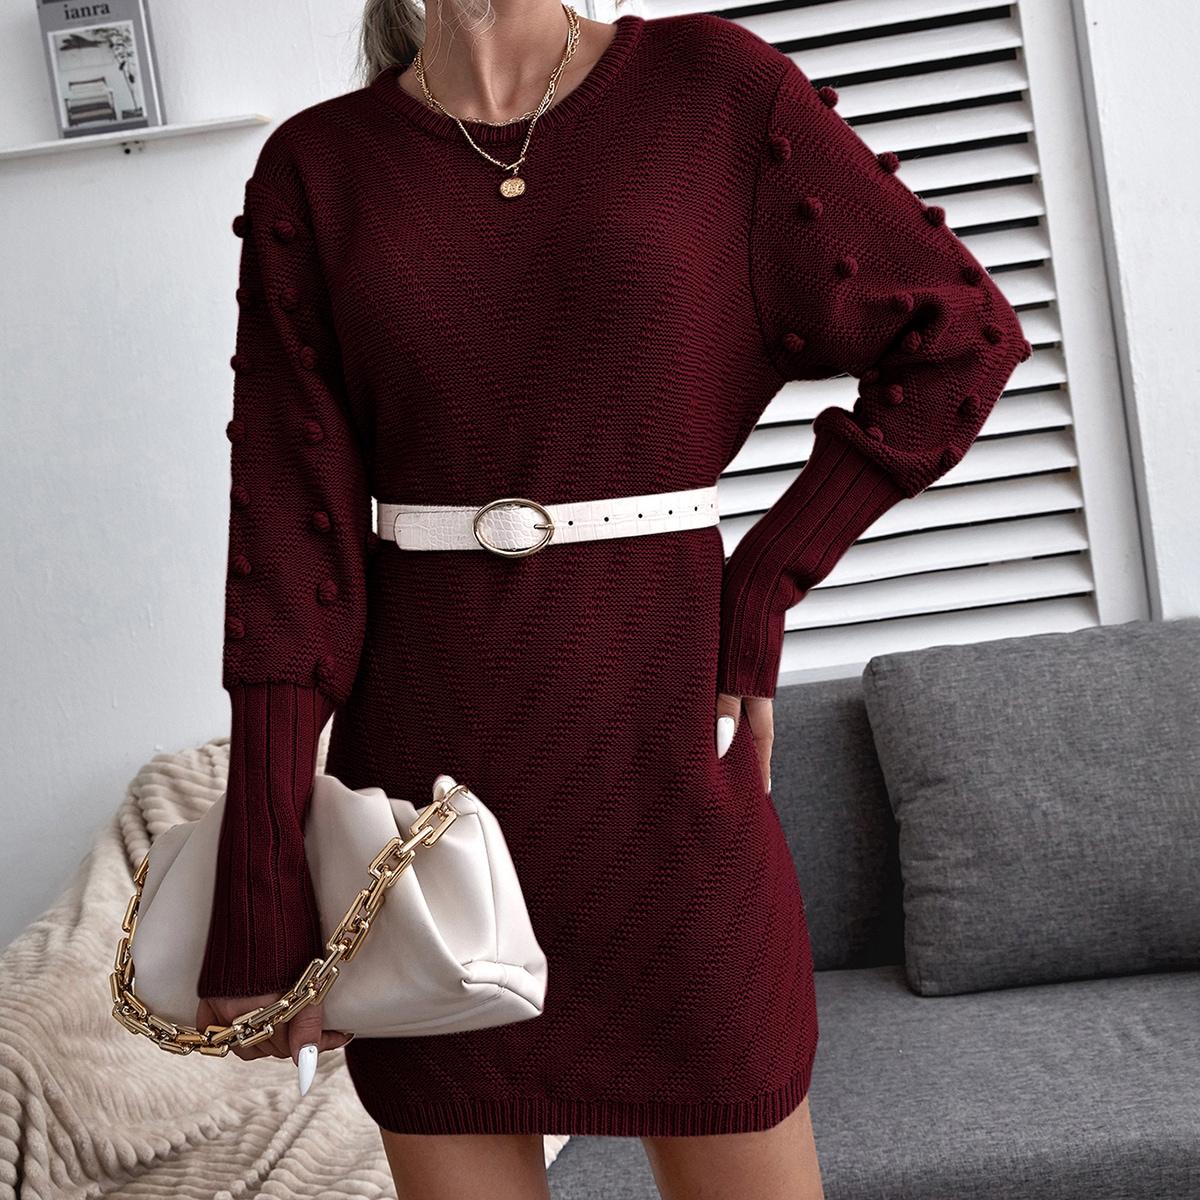 Popcorn Knit Sleeve Sweater Dress Without Belt